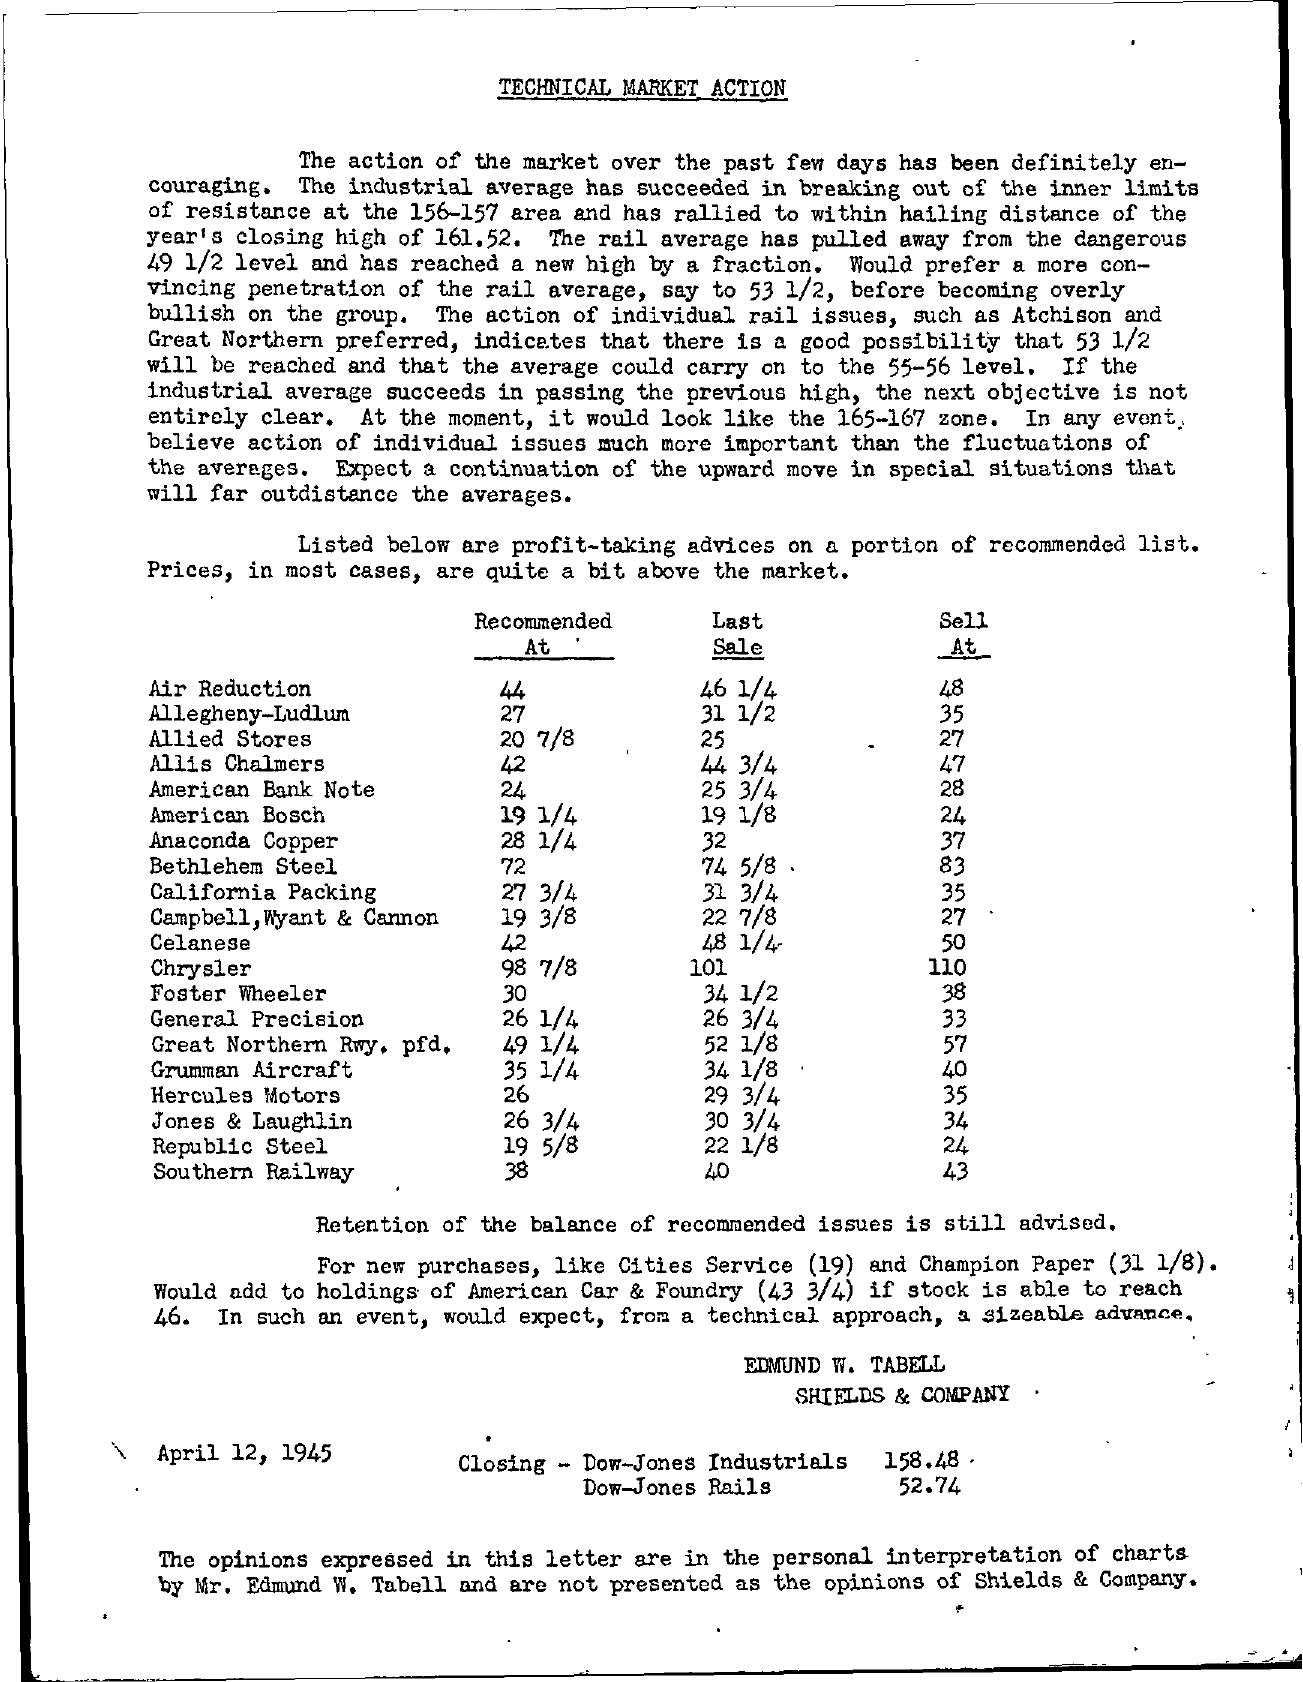 Tabell's Market Letter - April 12, 1945